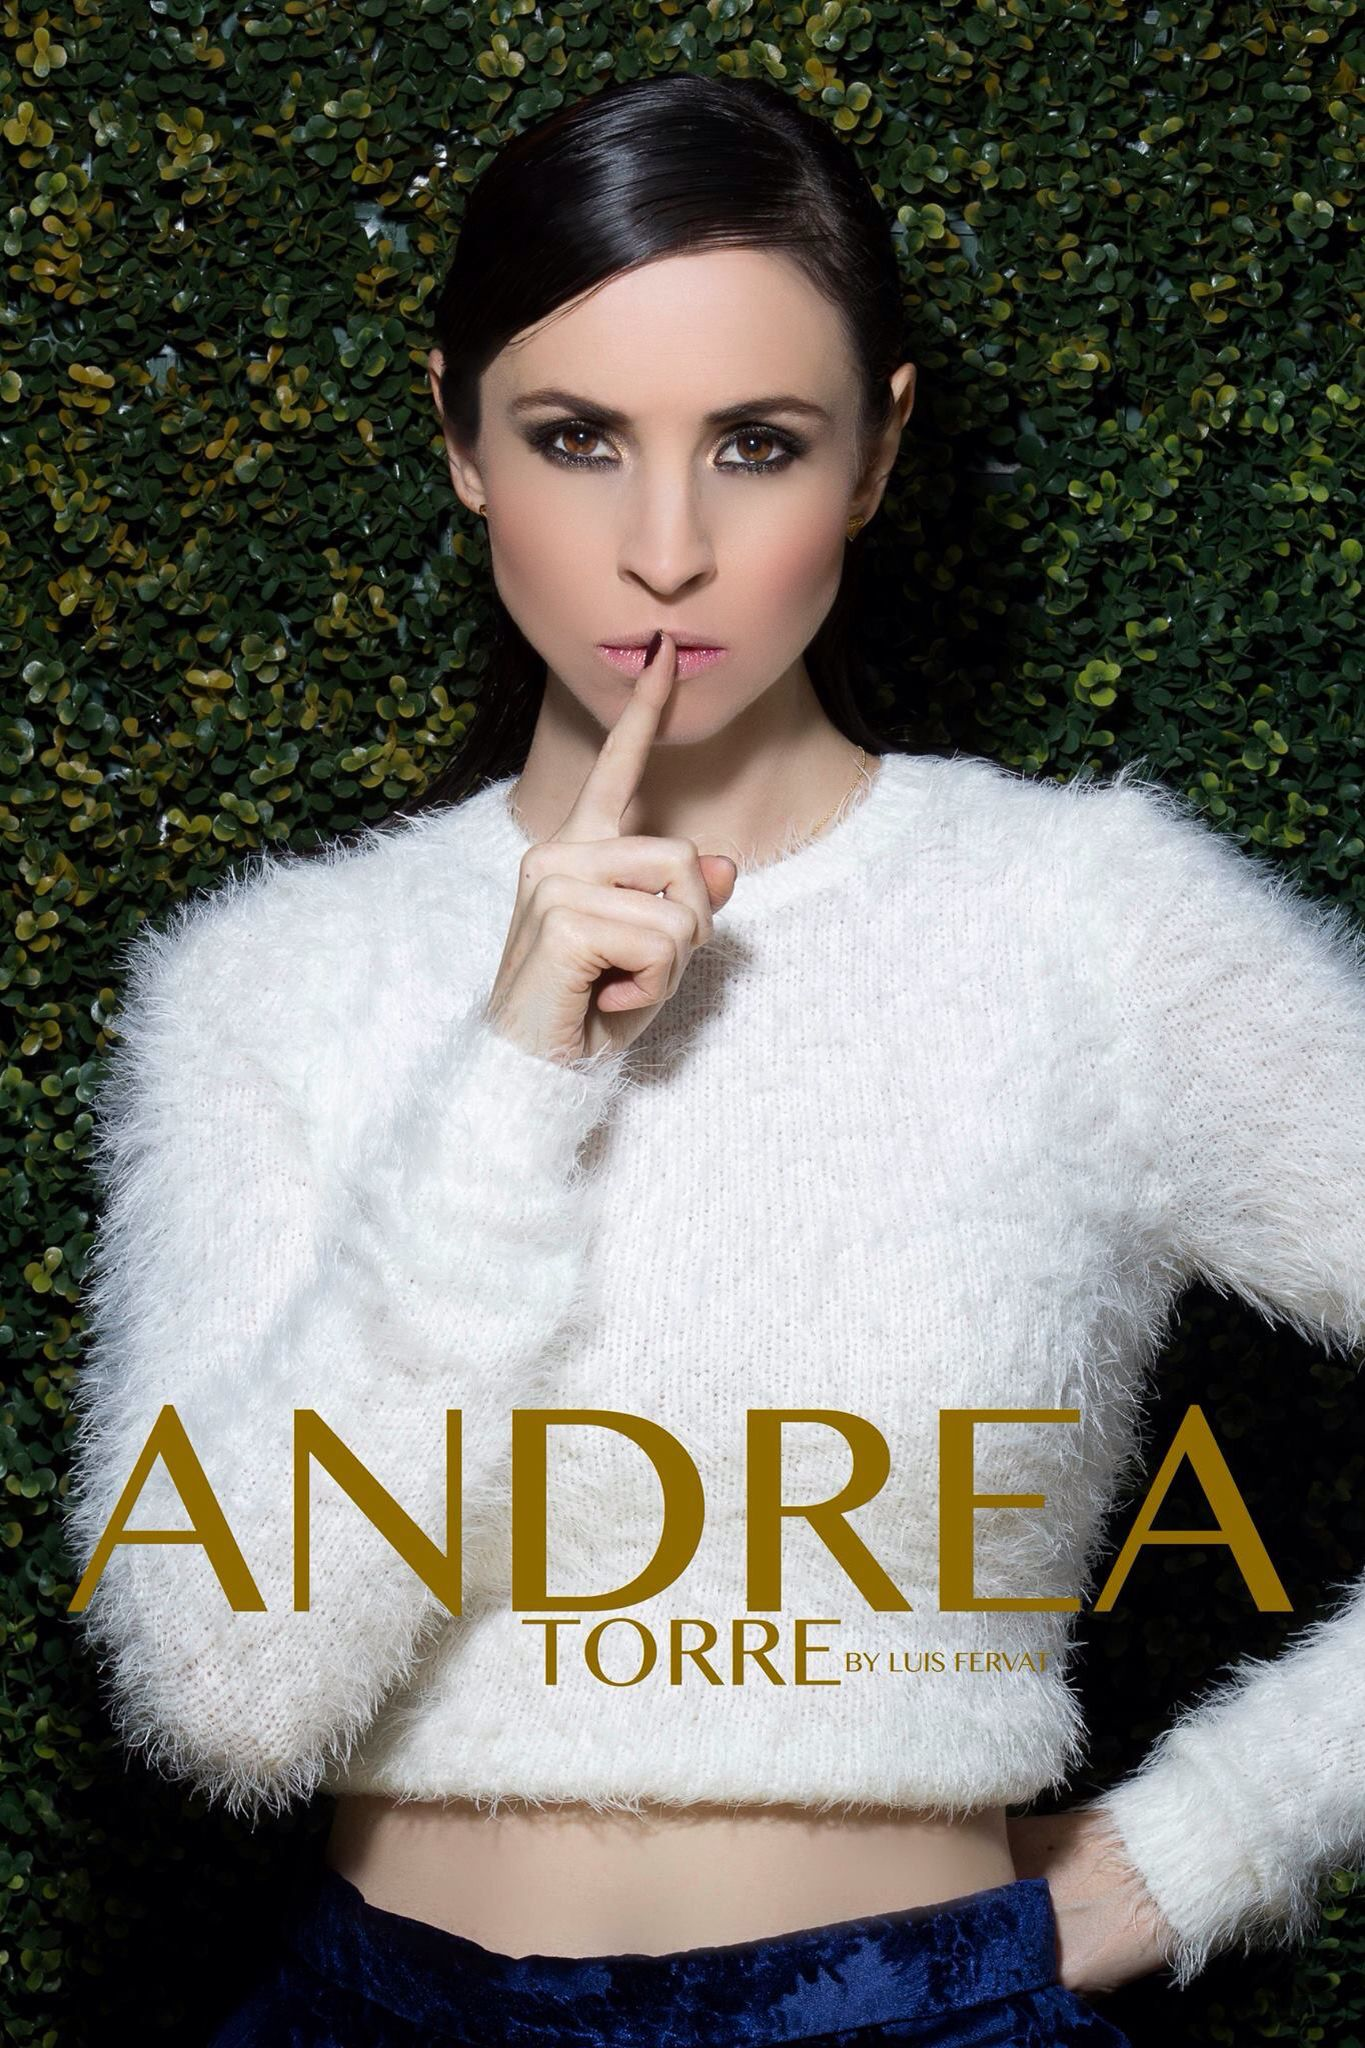 Andrea Torre